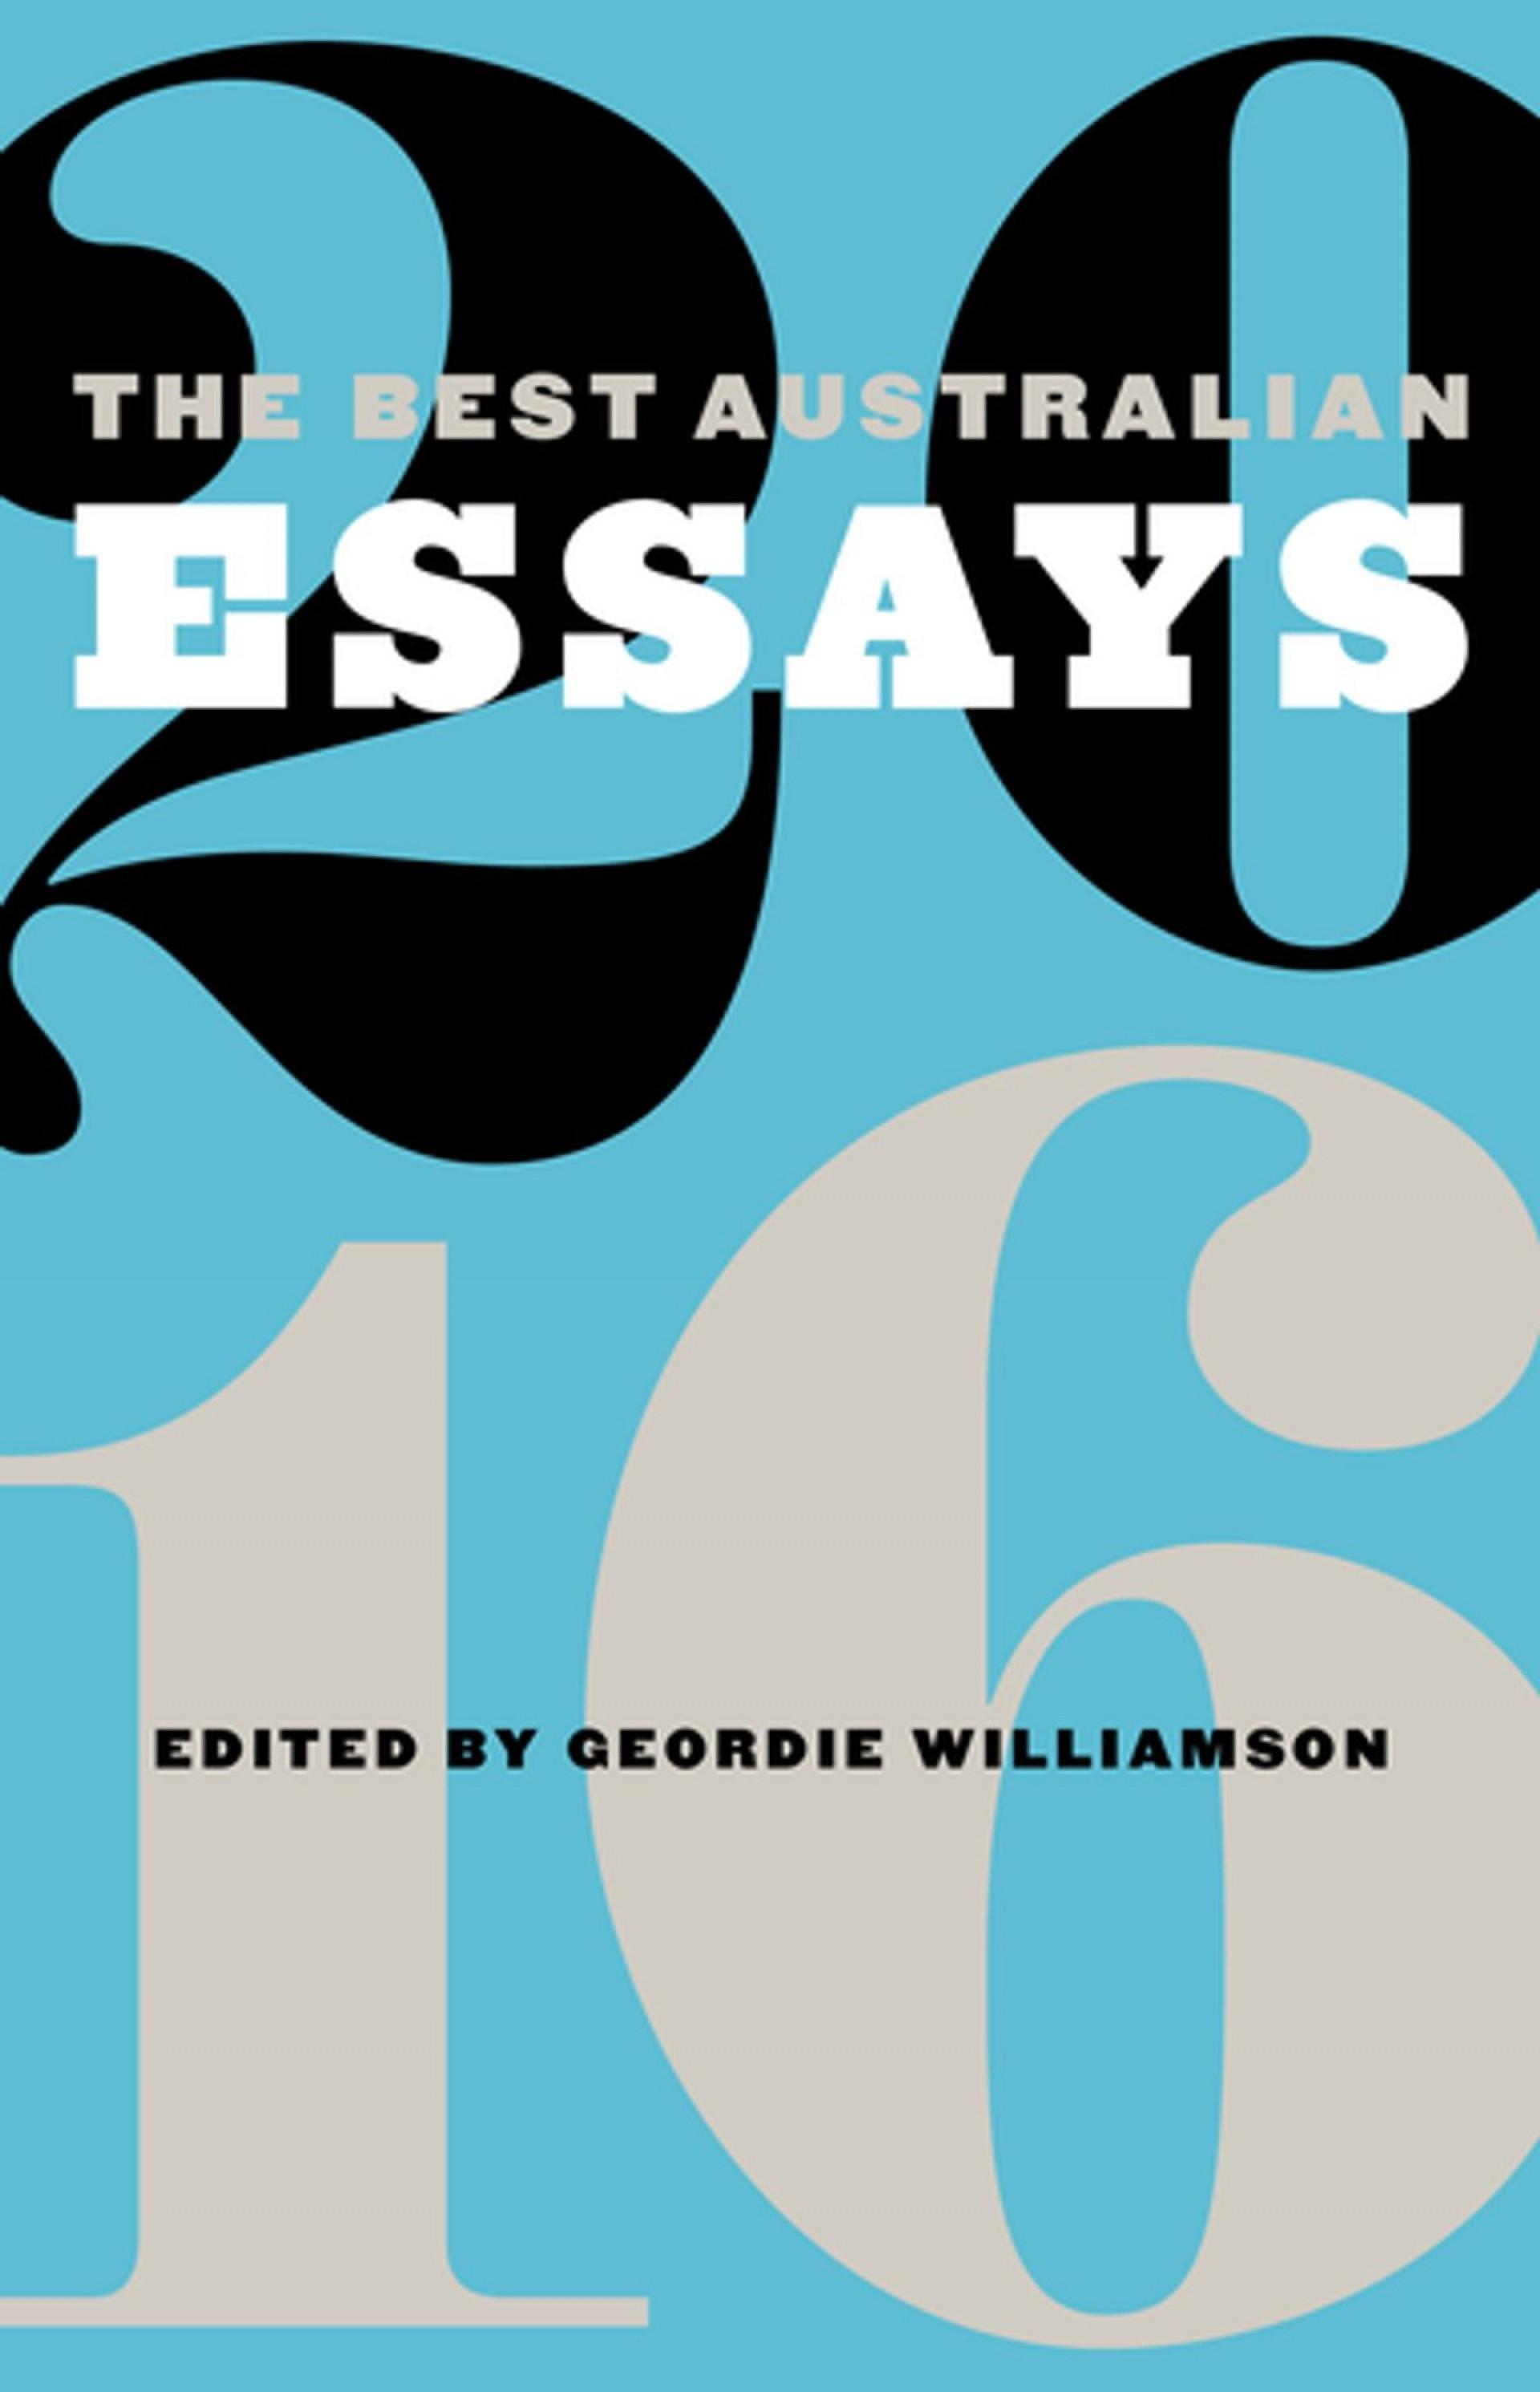 009 The Best Australian Essays Essay Breathtaking 2016 American Audiobook Short Pdf 1920